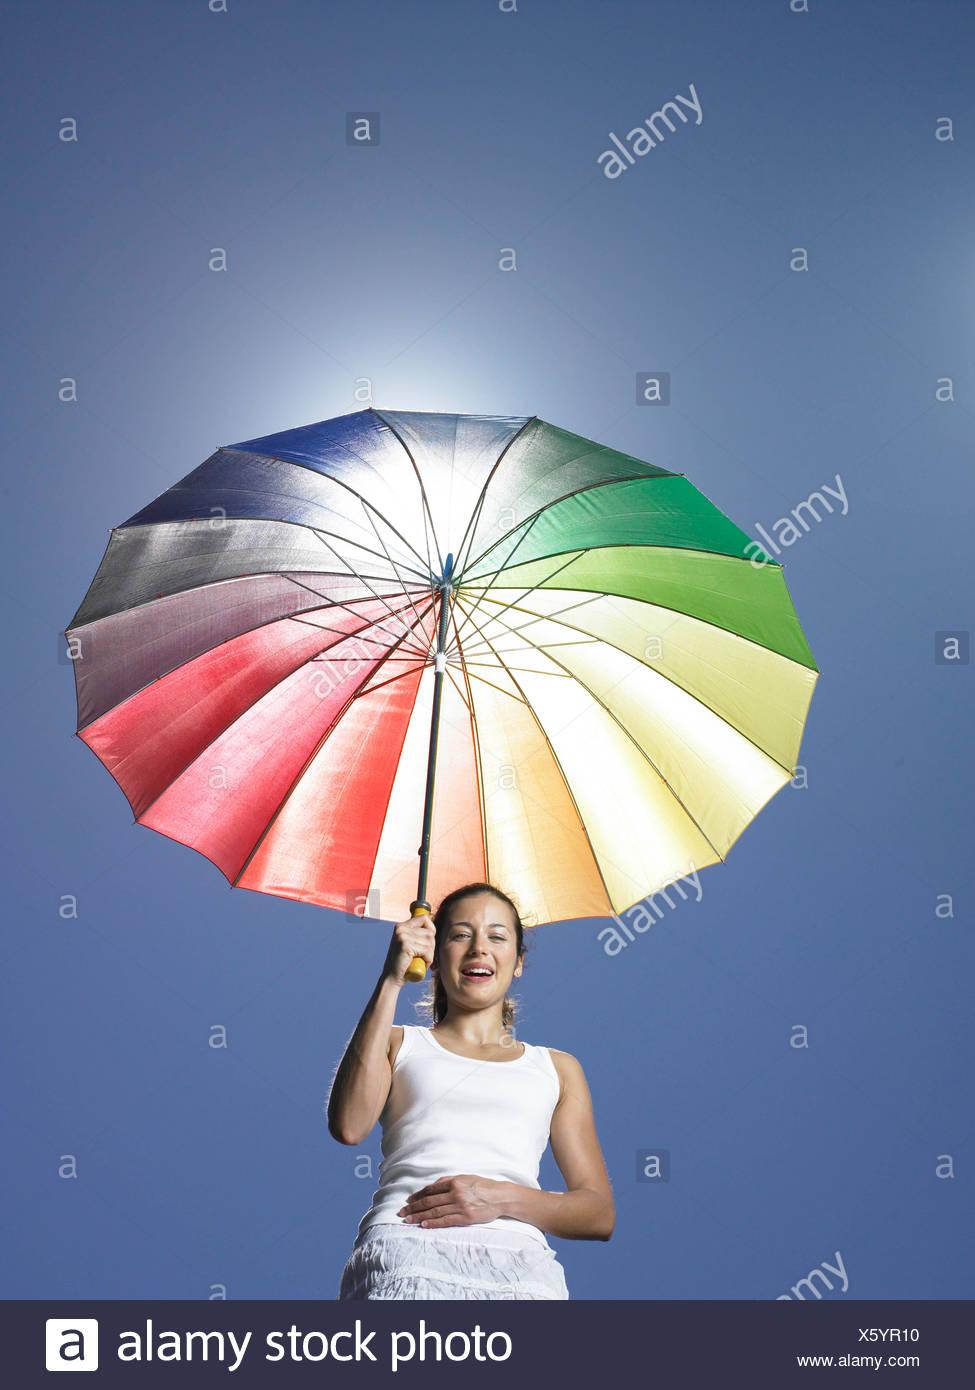 Girl holding sun parasol - Stock Image